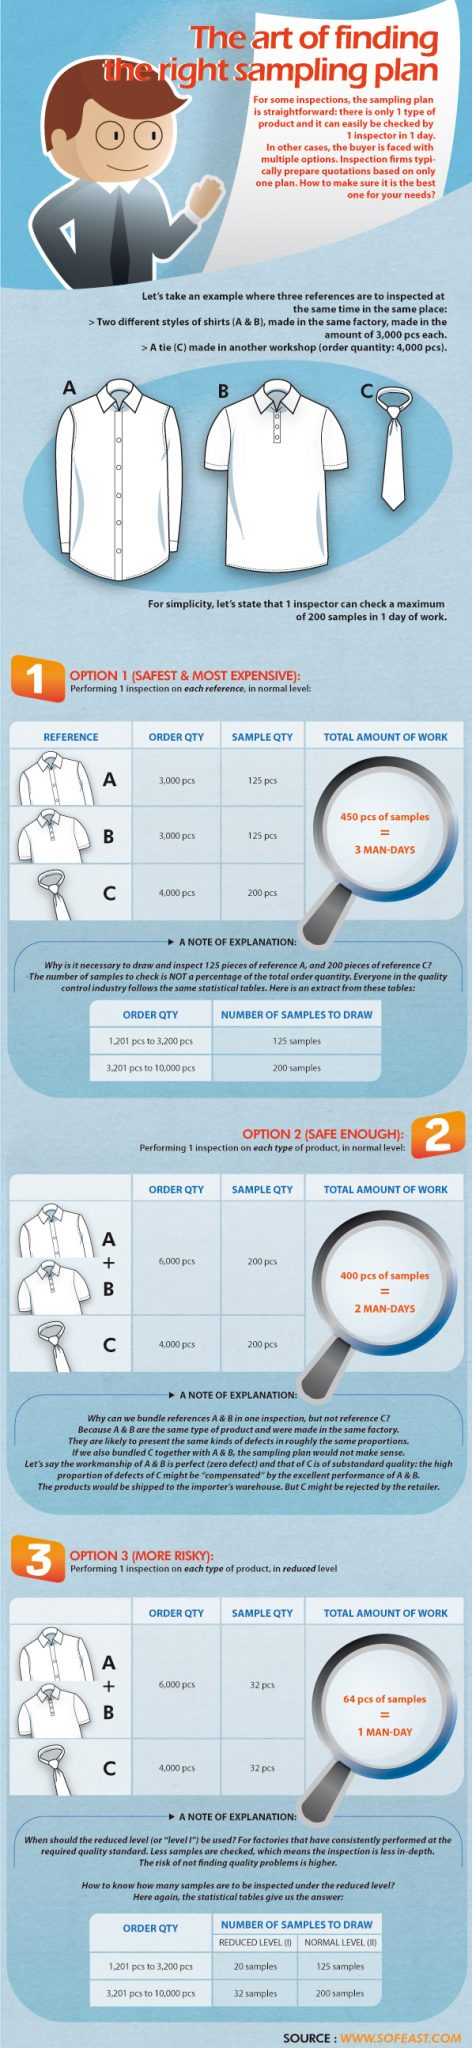 Choosing the right sampling plan